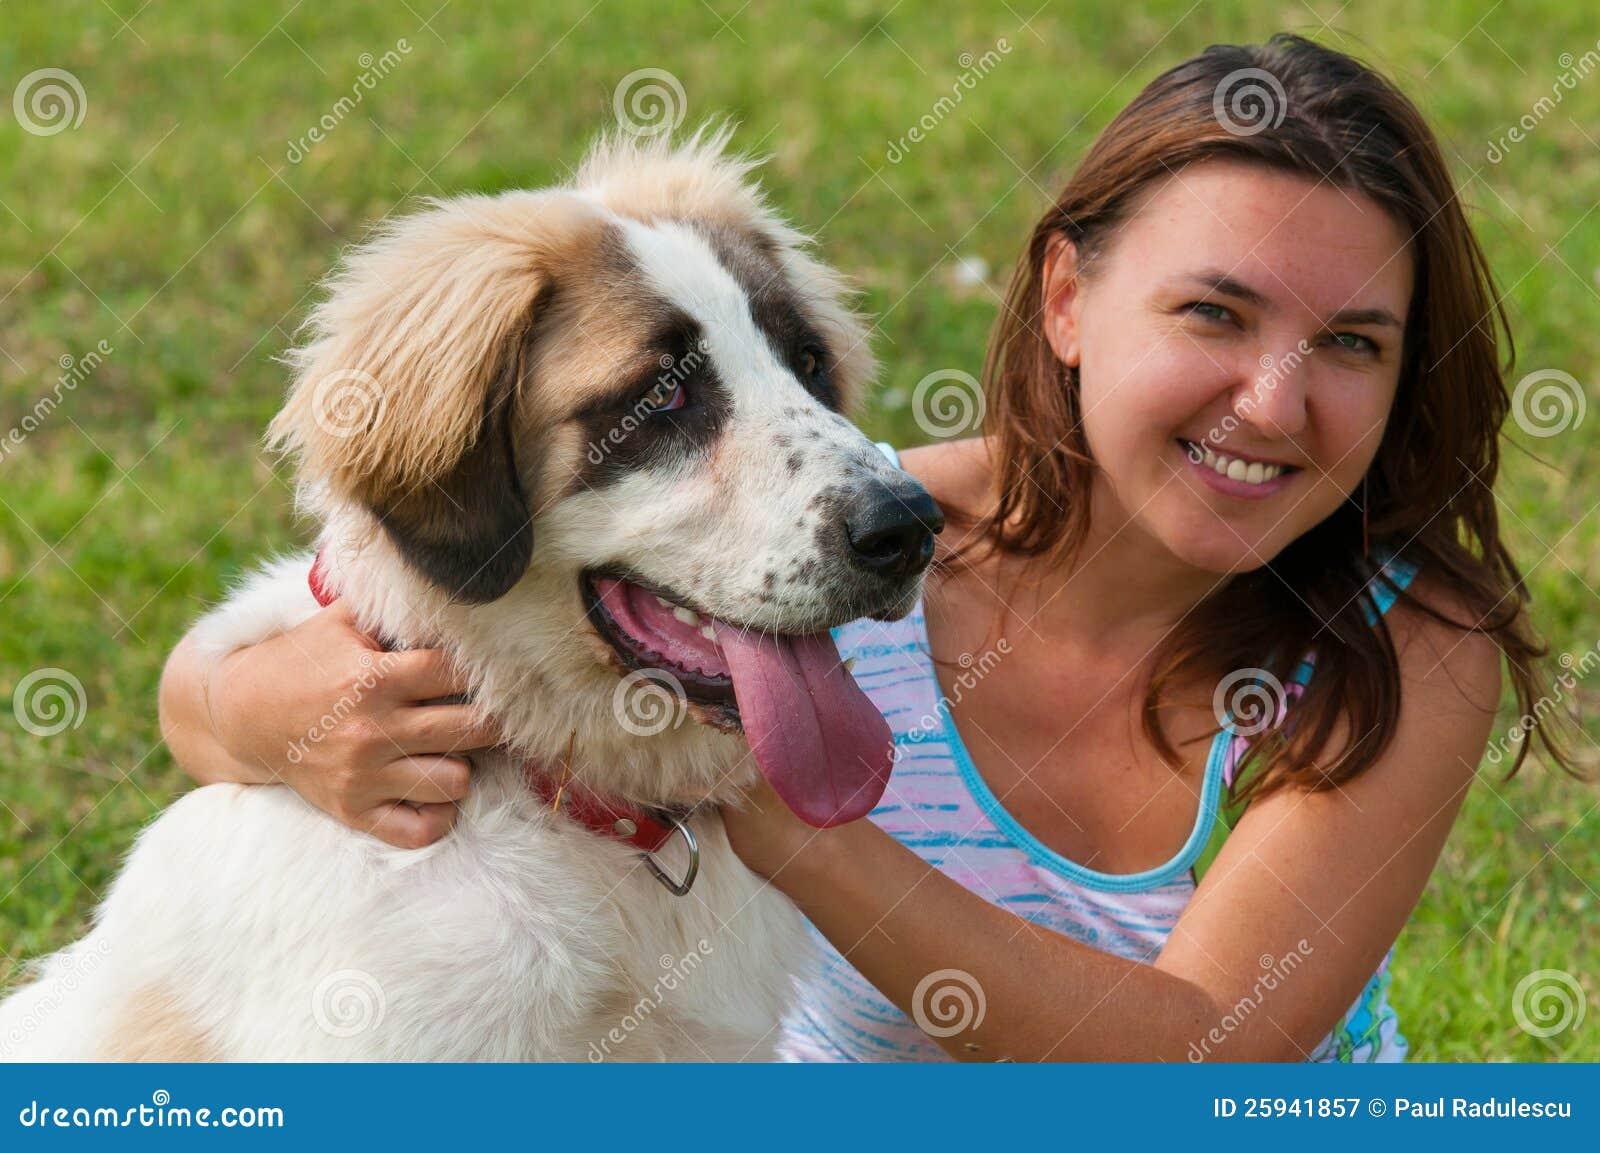 dogging sites beautiful companion Melbourne